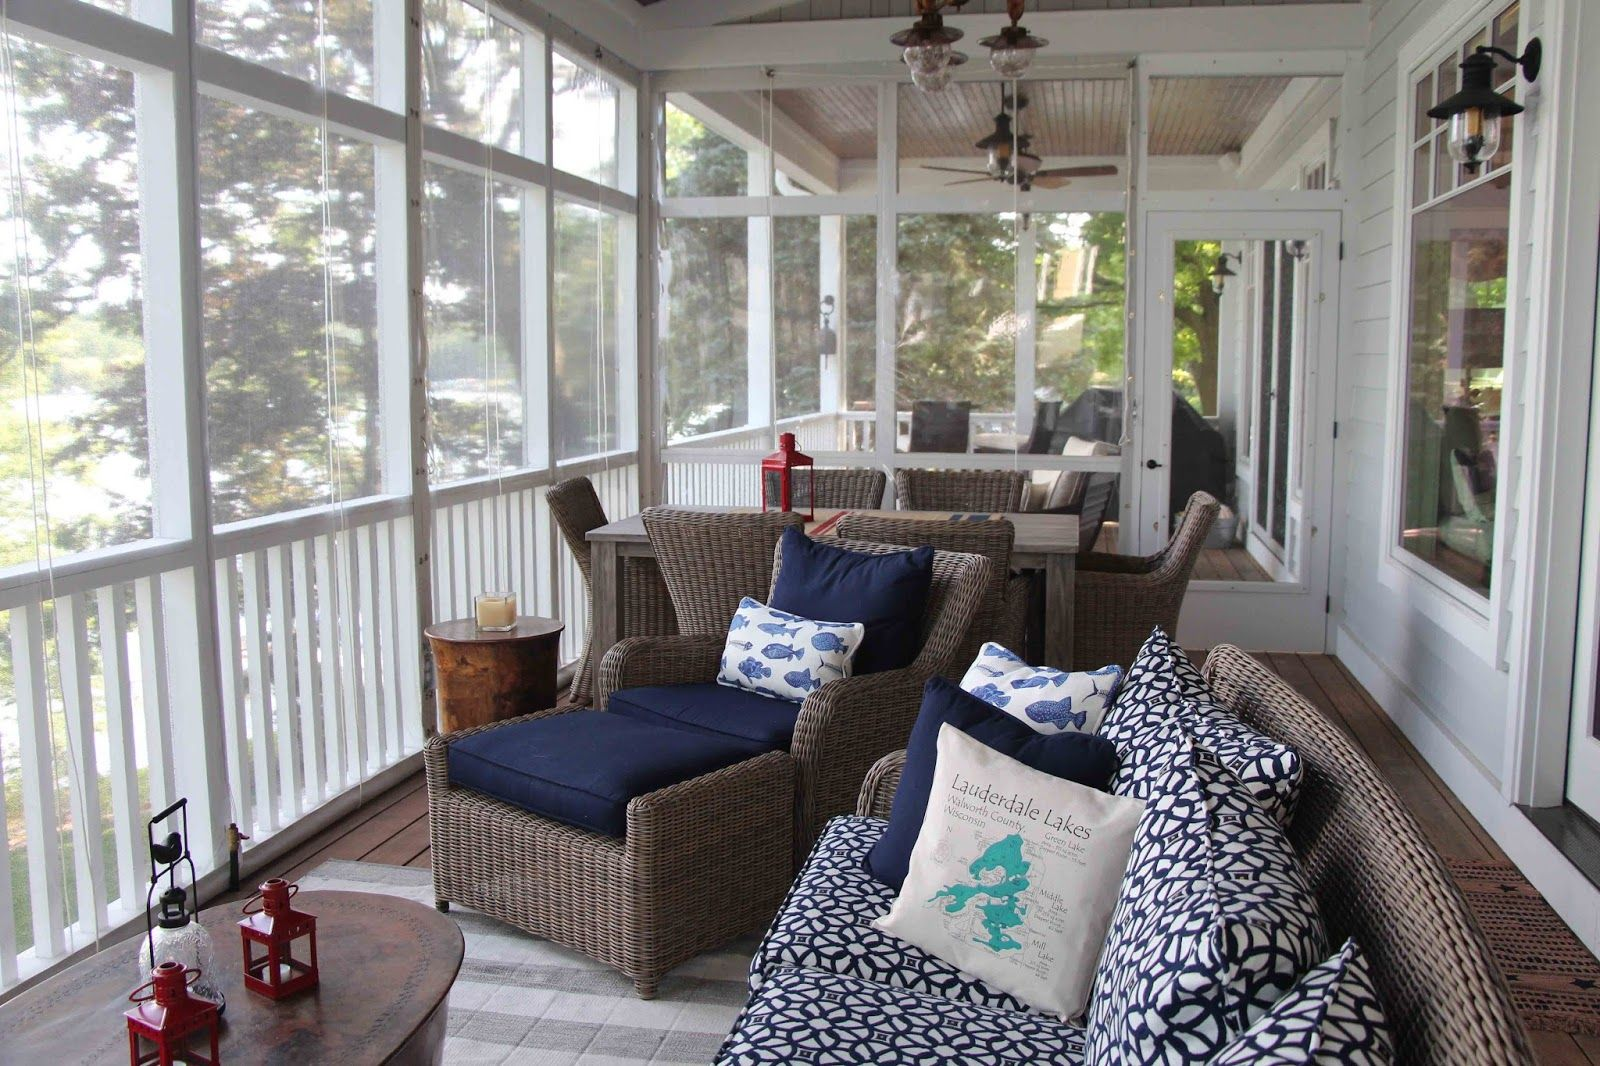 Lake House Decor Lakehouse Gifts Living The Lifestyle